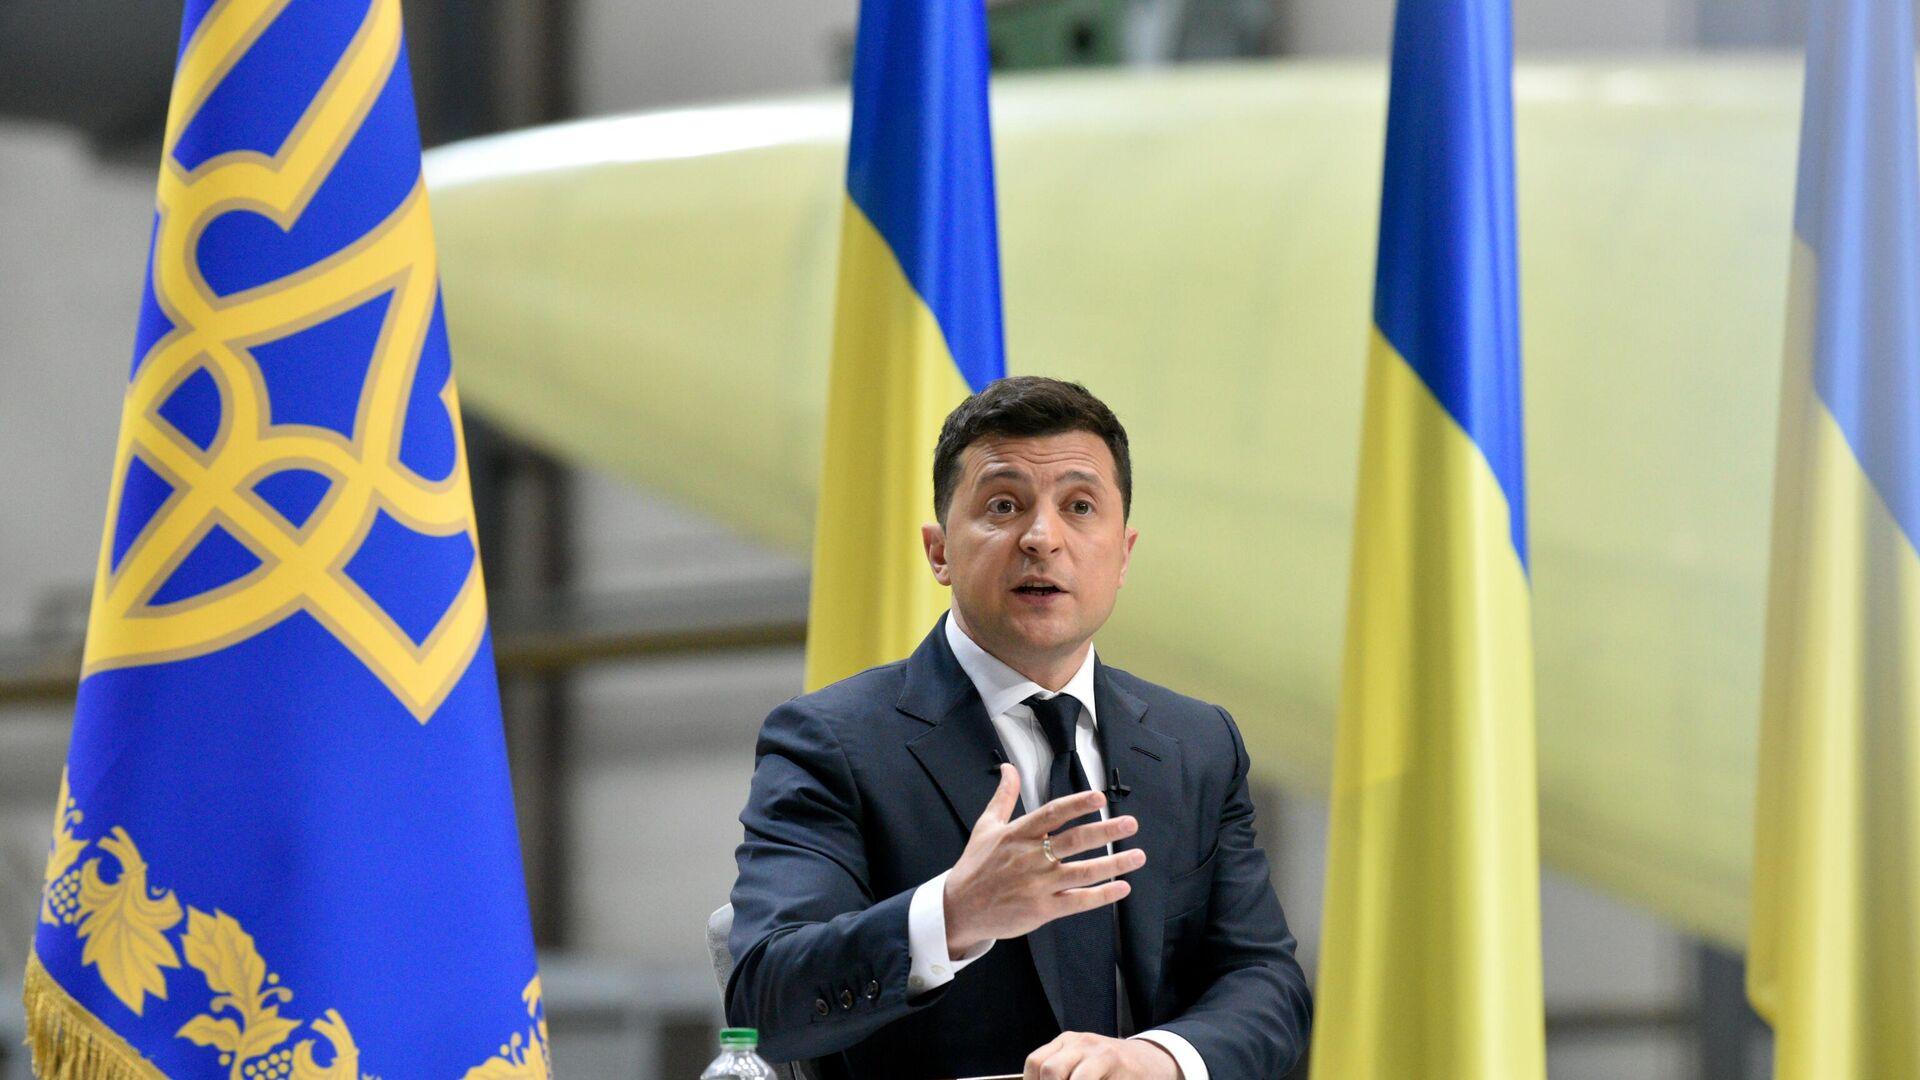 Il presidente ucraino Zelensky - Sputnik Italia, 1920, 14.06.2021